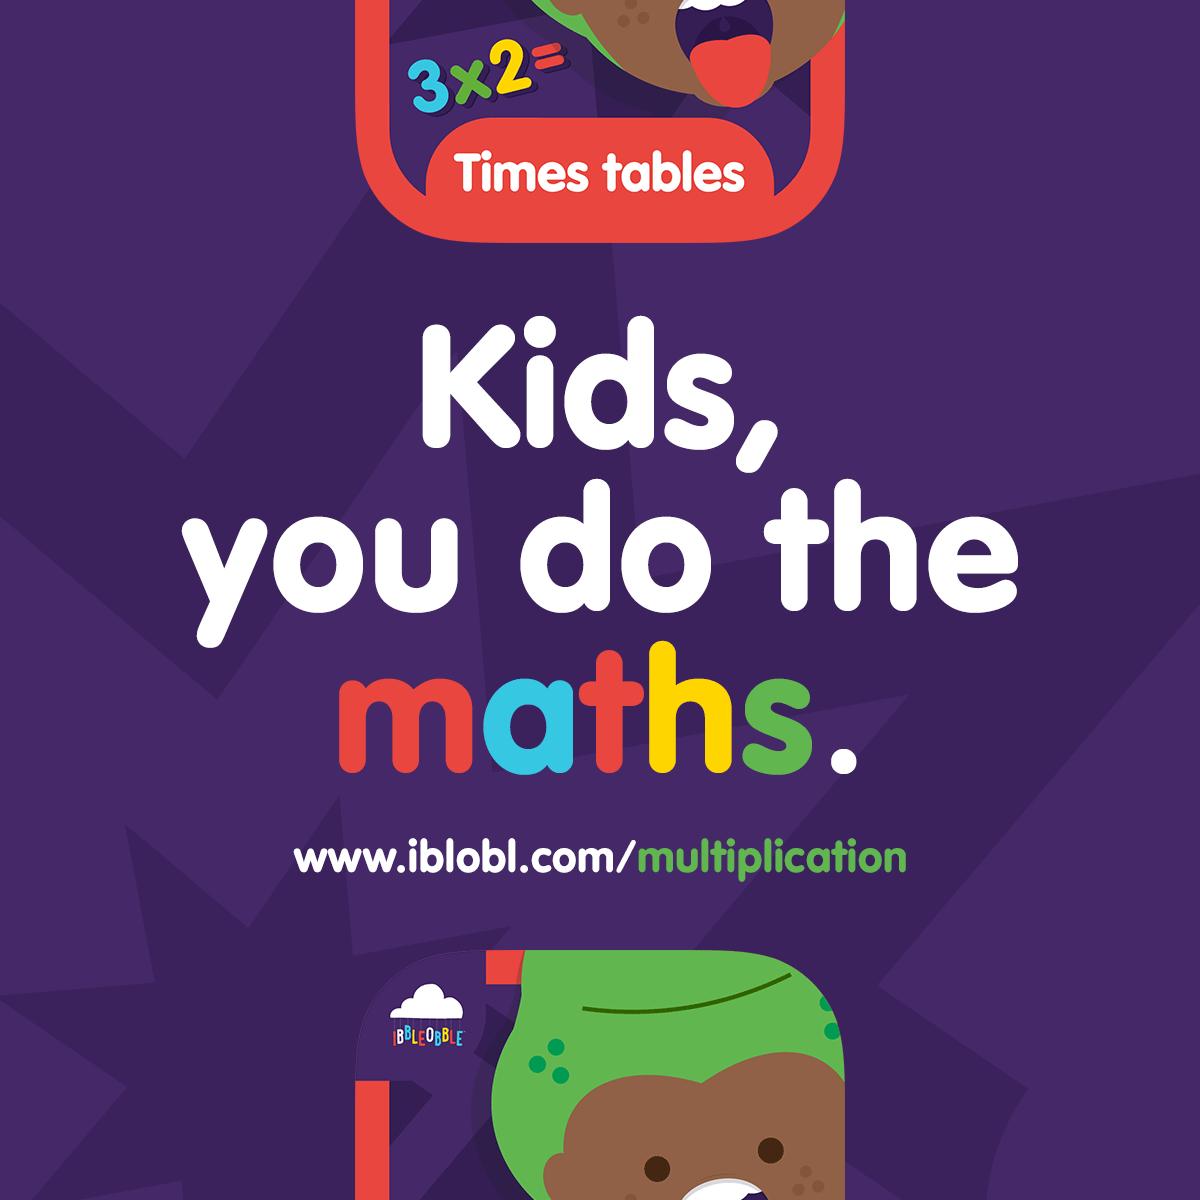 🐸 #Practice #multiplication the boring way or the #FUN way... #kids, you do the #maths!    #TimesTables #Math #Mathematics #primarySchool #school #homeschool #homeschooling #thursdaymotivation #thursdaythoughts